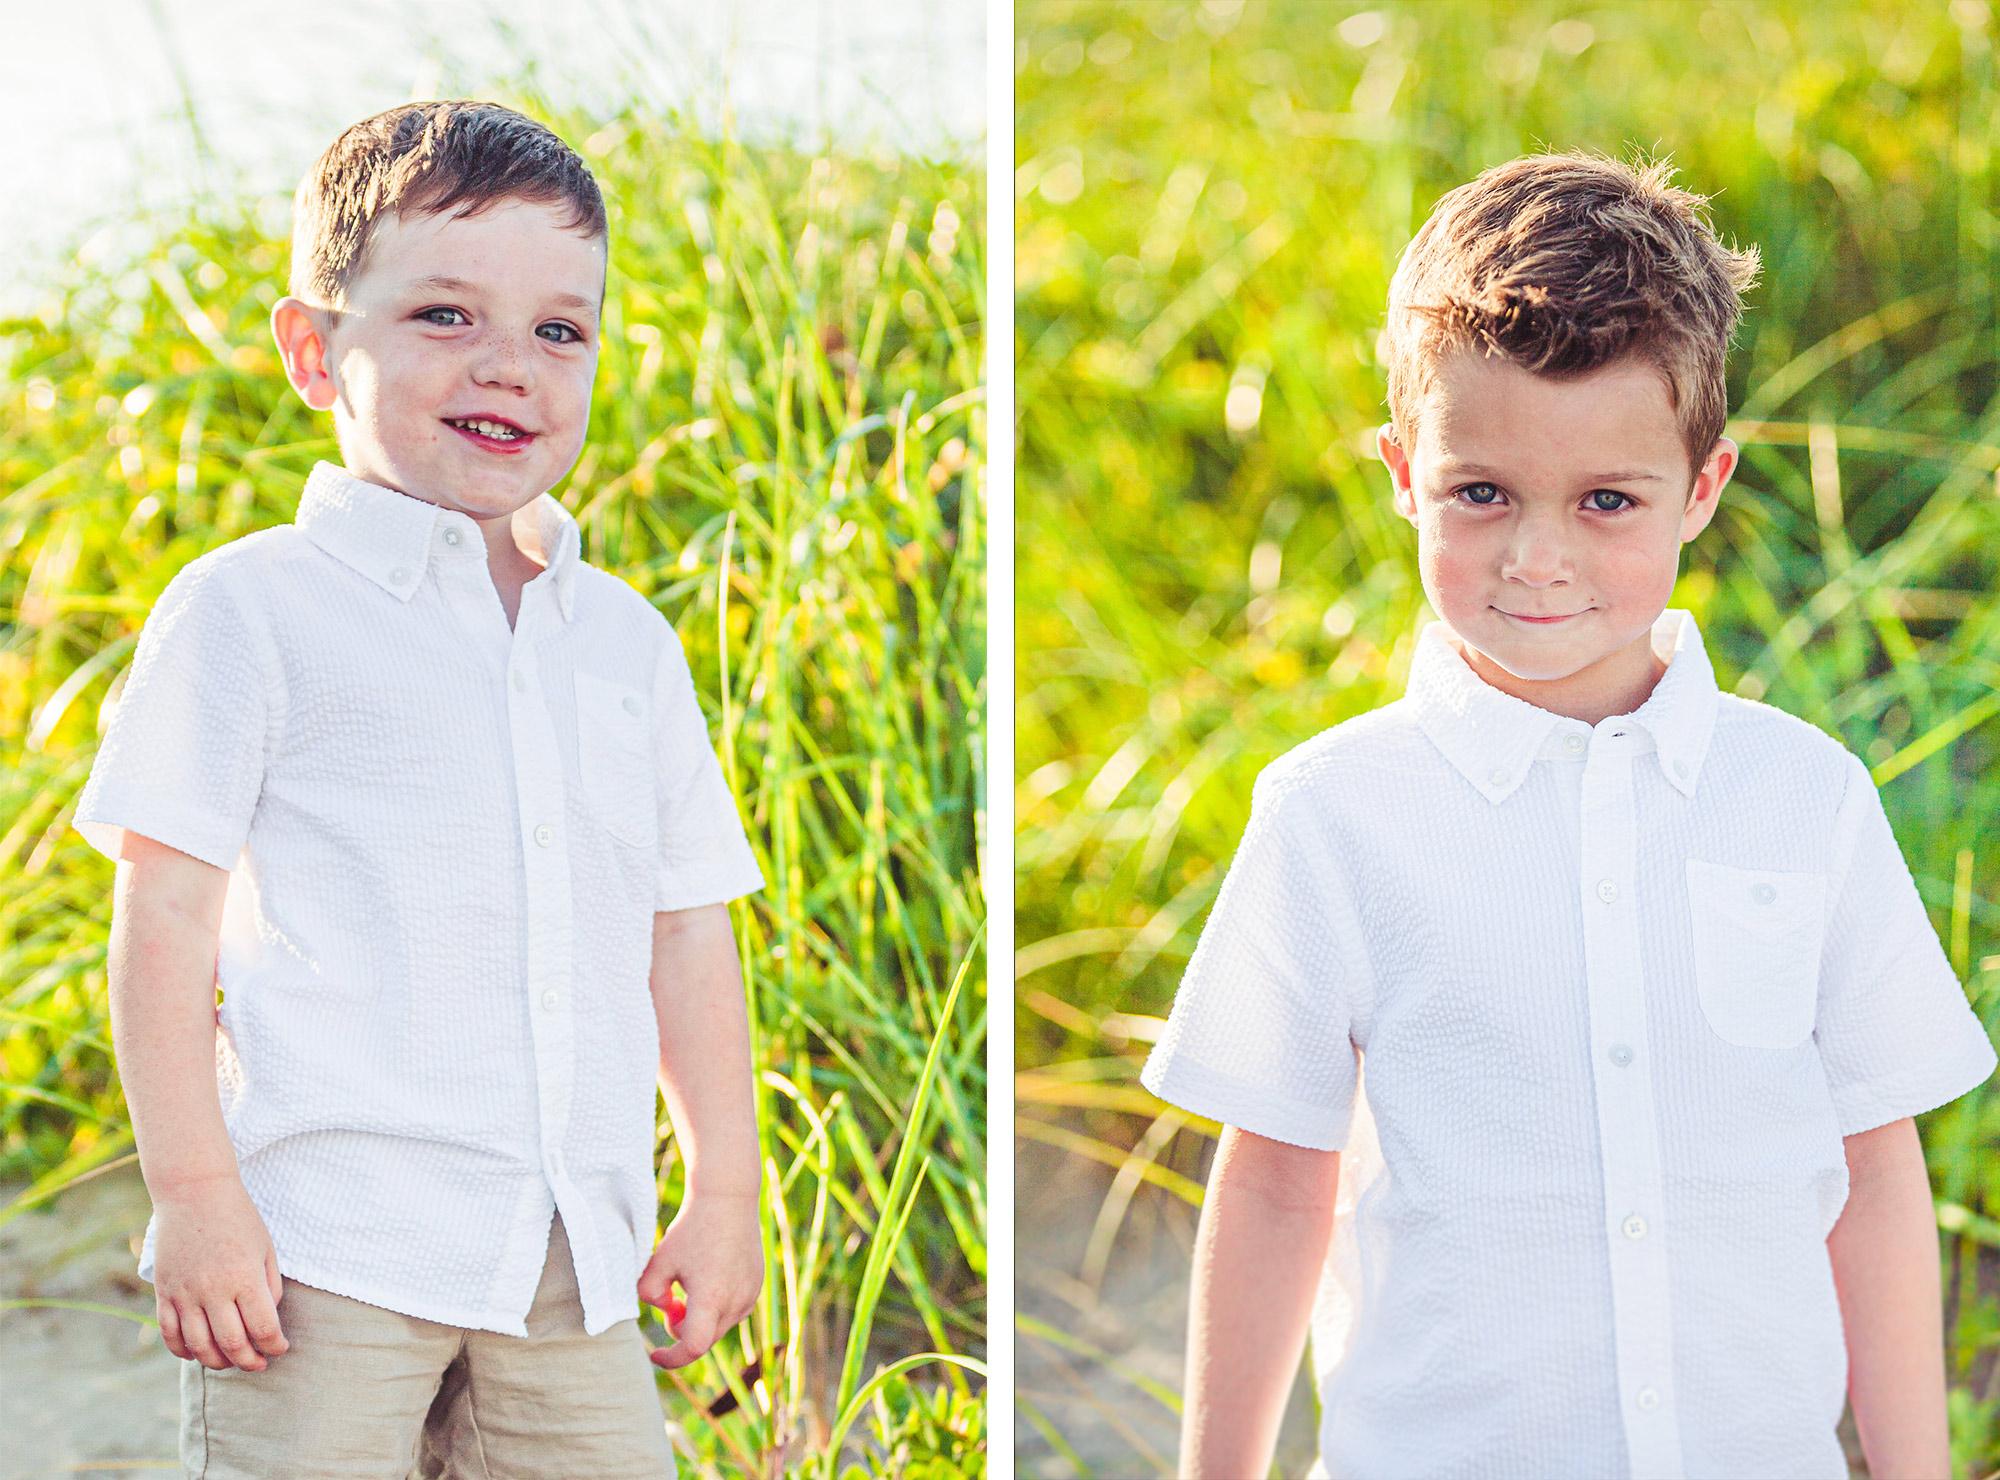 Crane Beach Family Portraits   Stephen Grant Photography